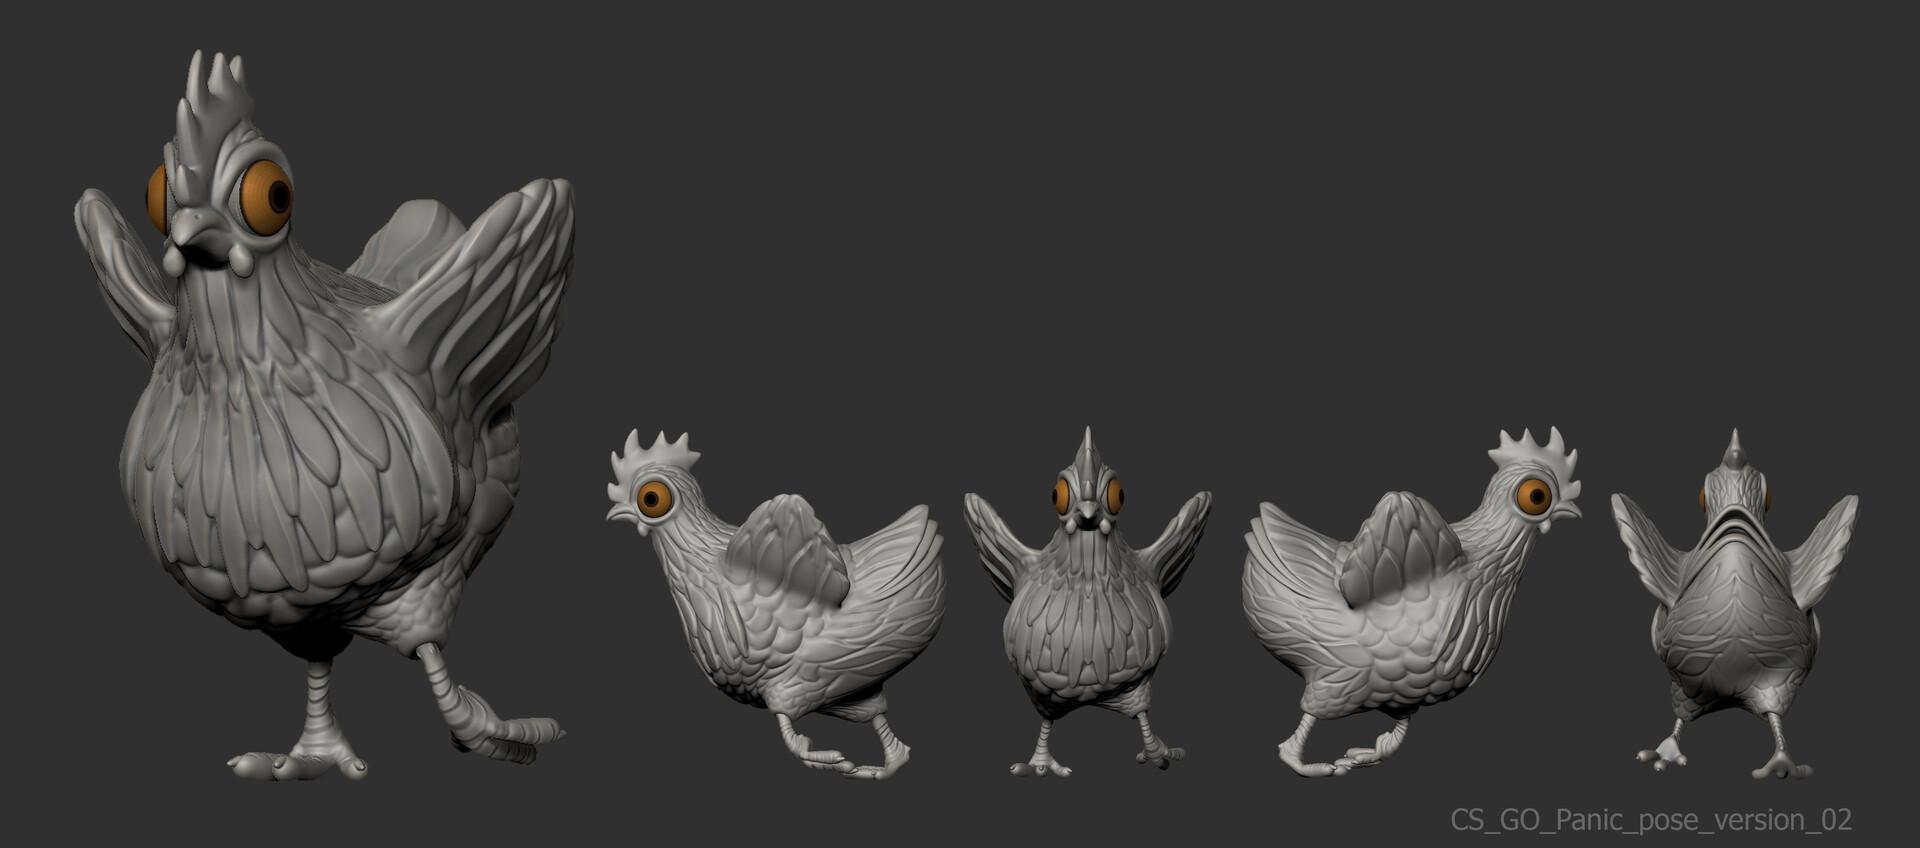 Siserman Oana Alexandra - CSGO Chicken Character FanArt